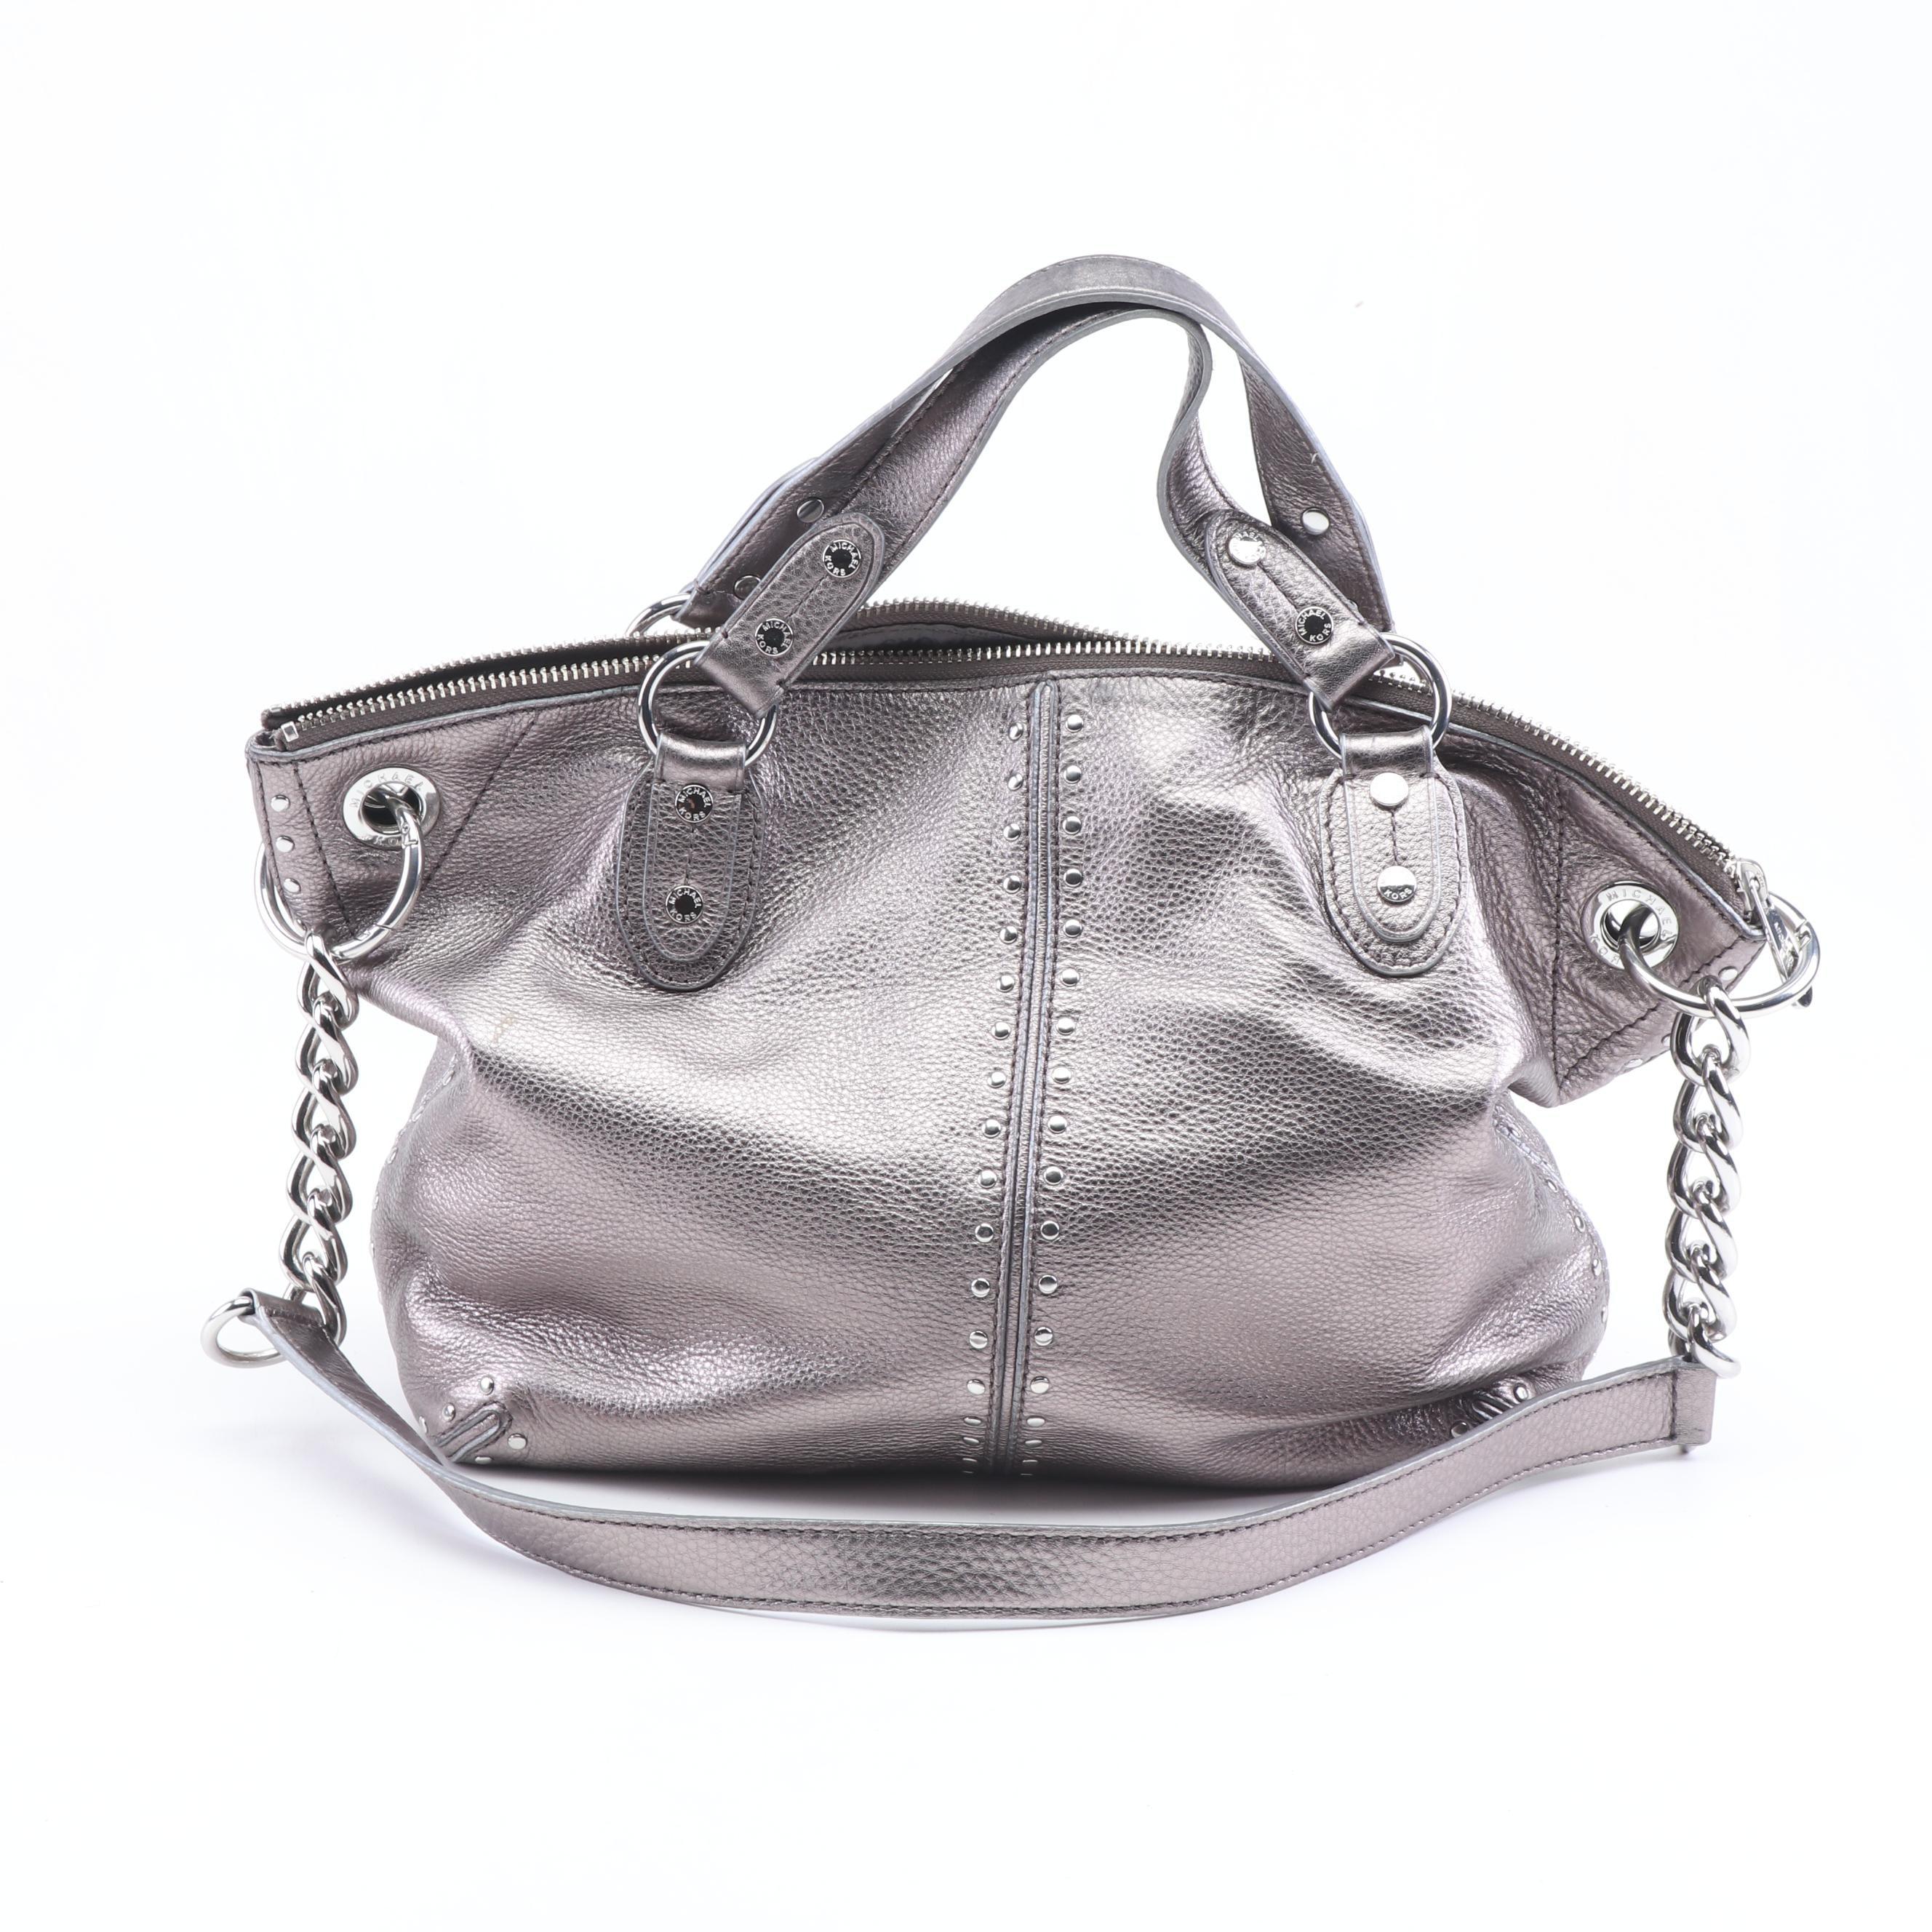 MICHAEL Michael Kors Silver Metallic Pebbled Leather Convertible Handbag